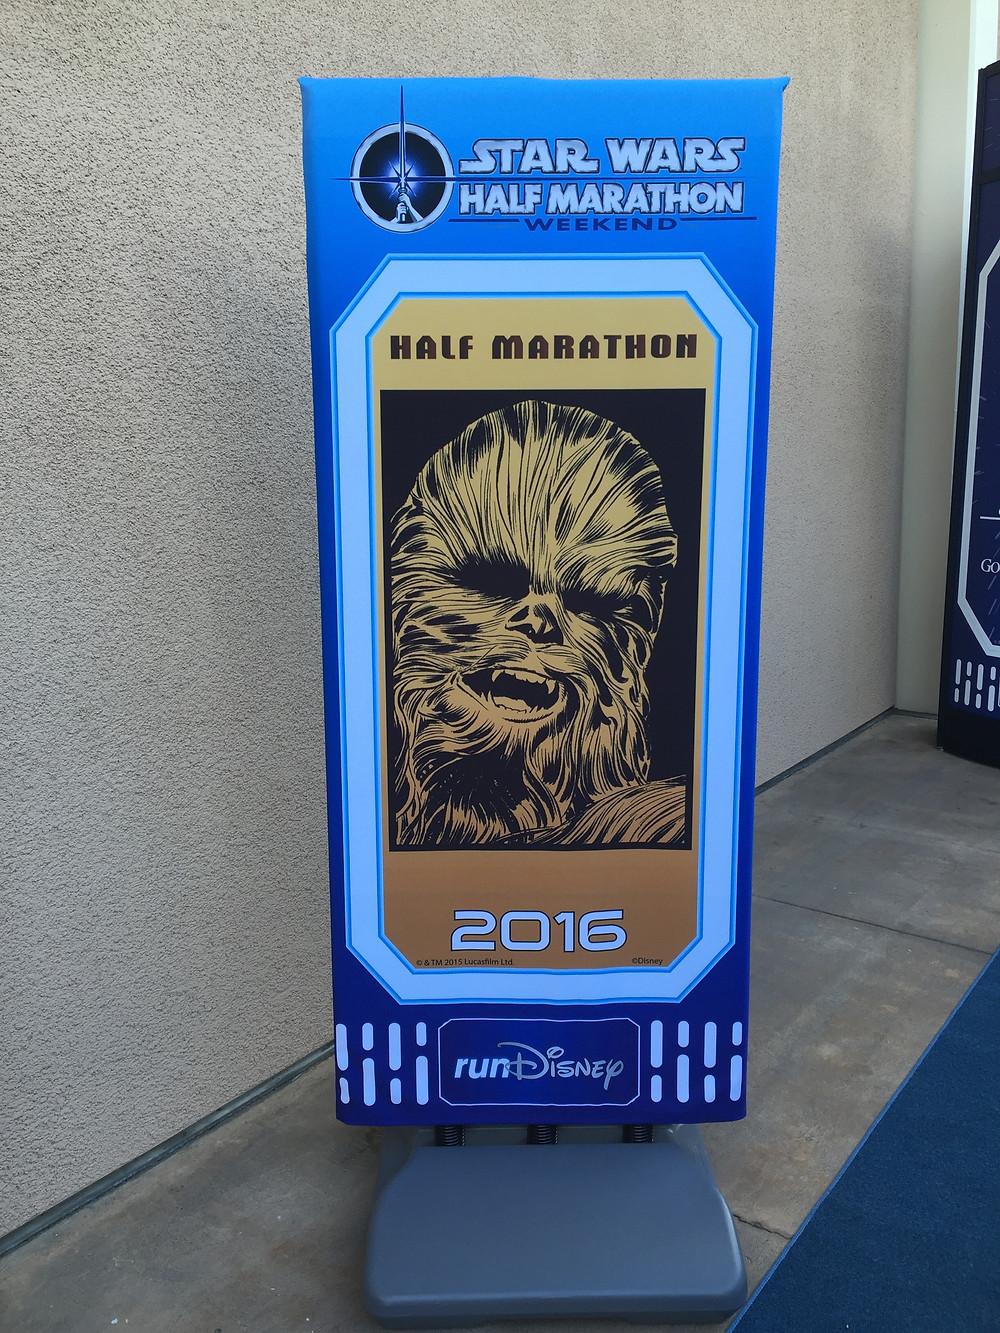 EscapeReno - runDisney Half Marathon Expo at Disneyland